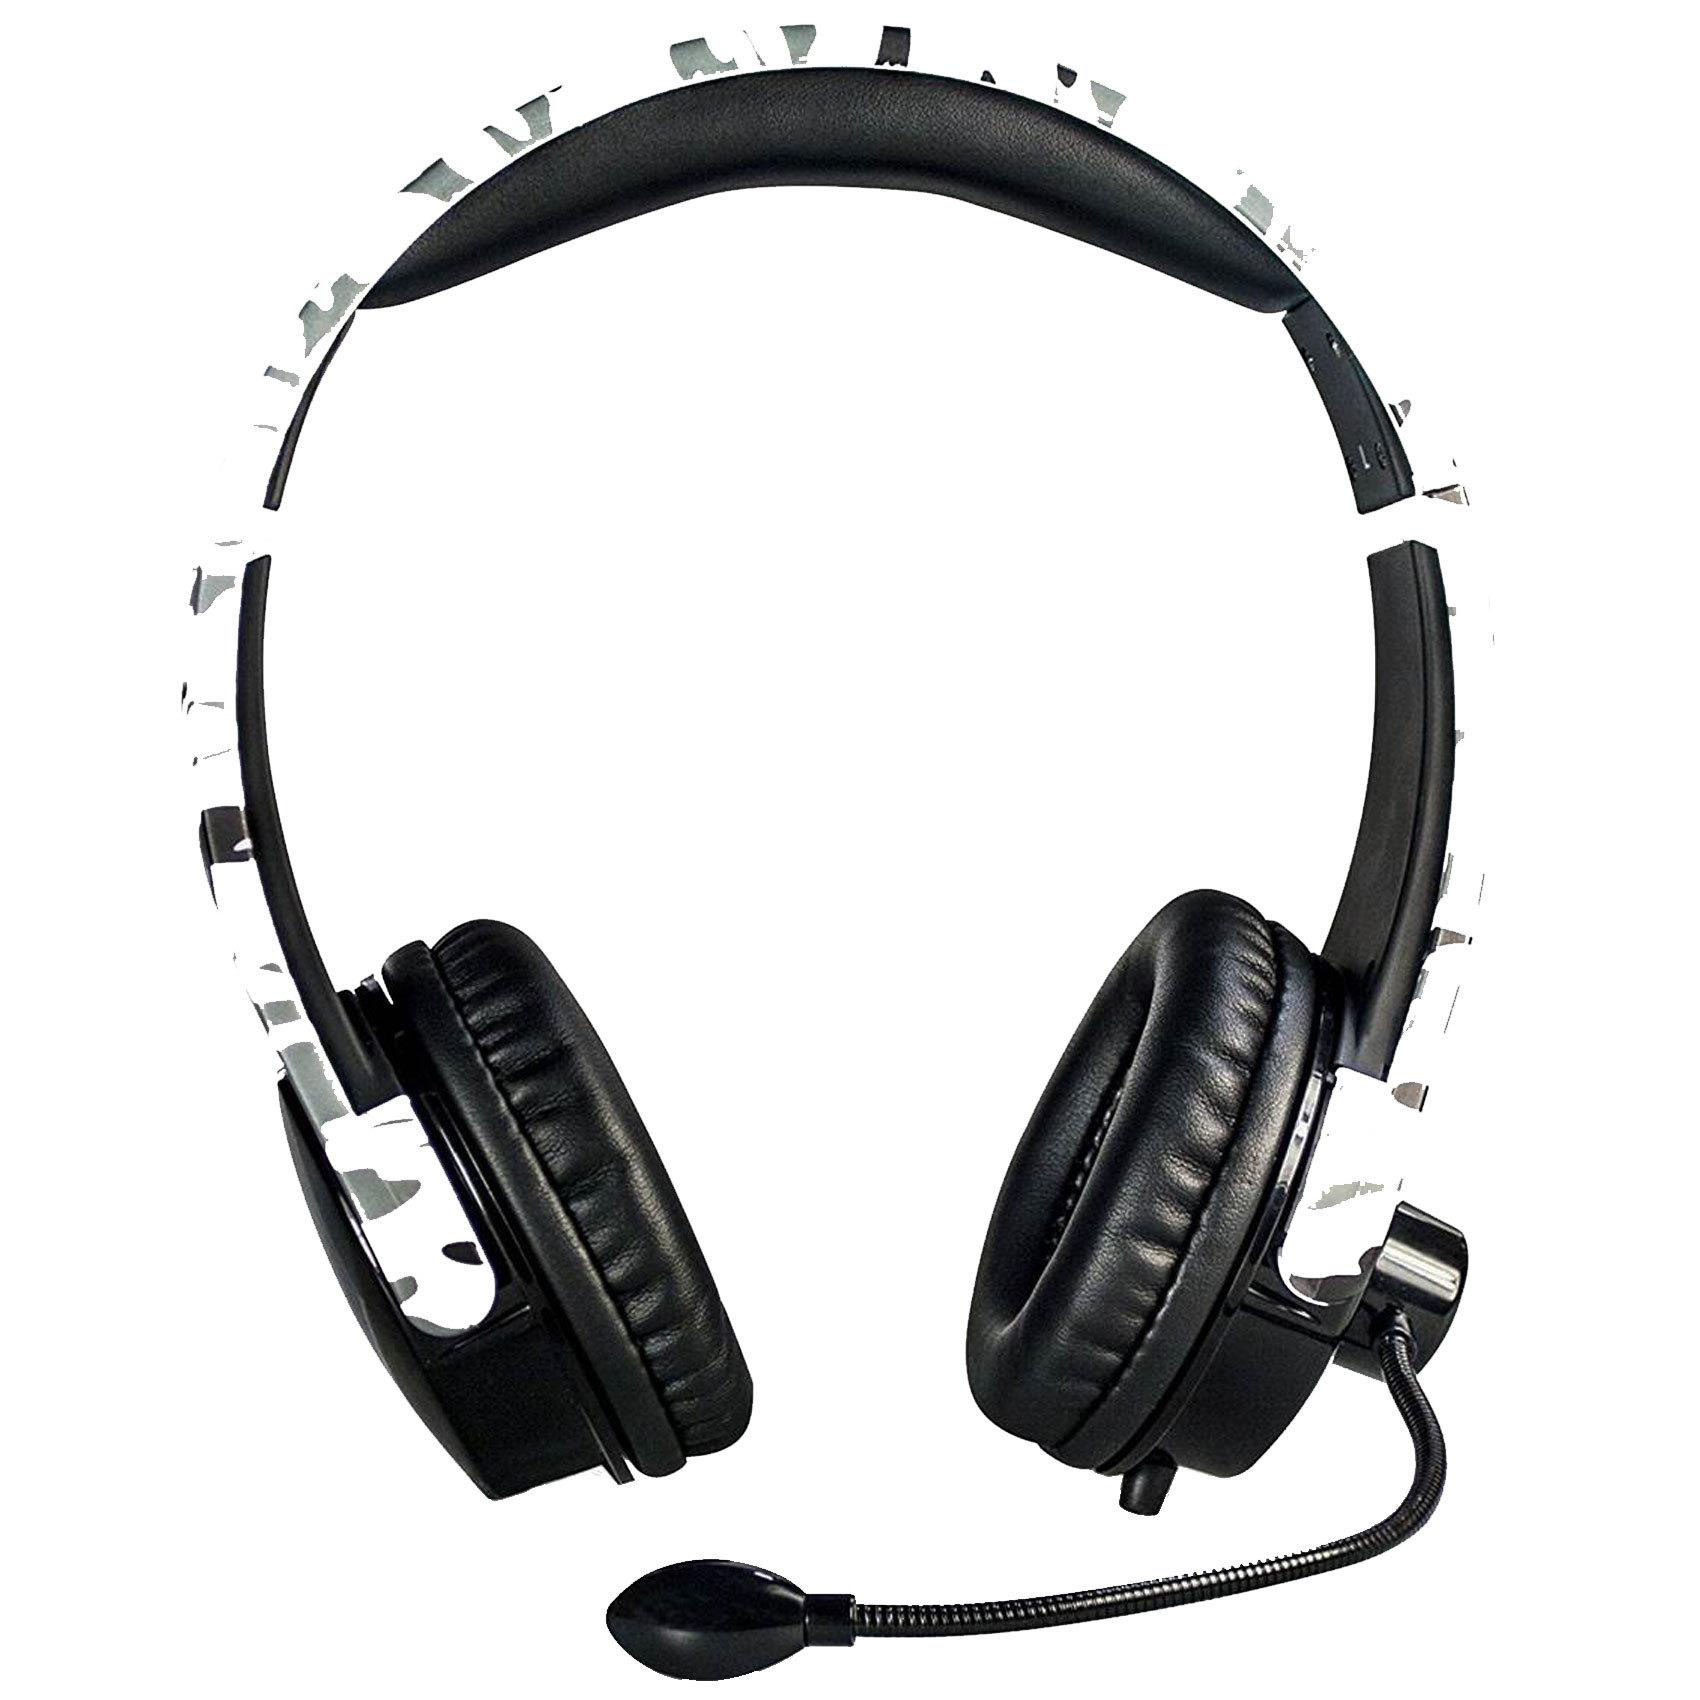 SONY PS4 H/S KIT ARCTIC CAMO